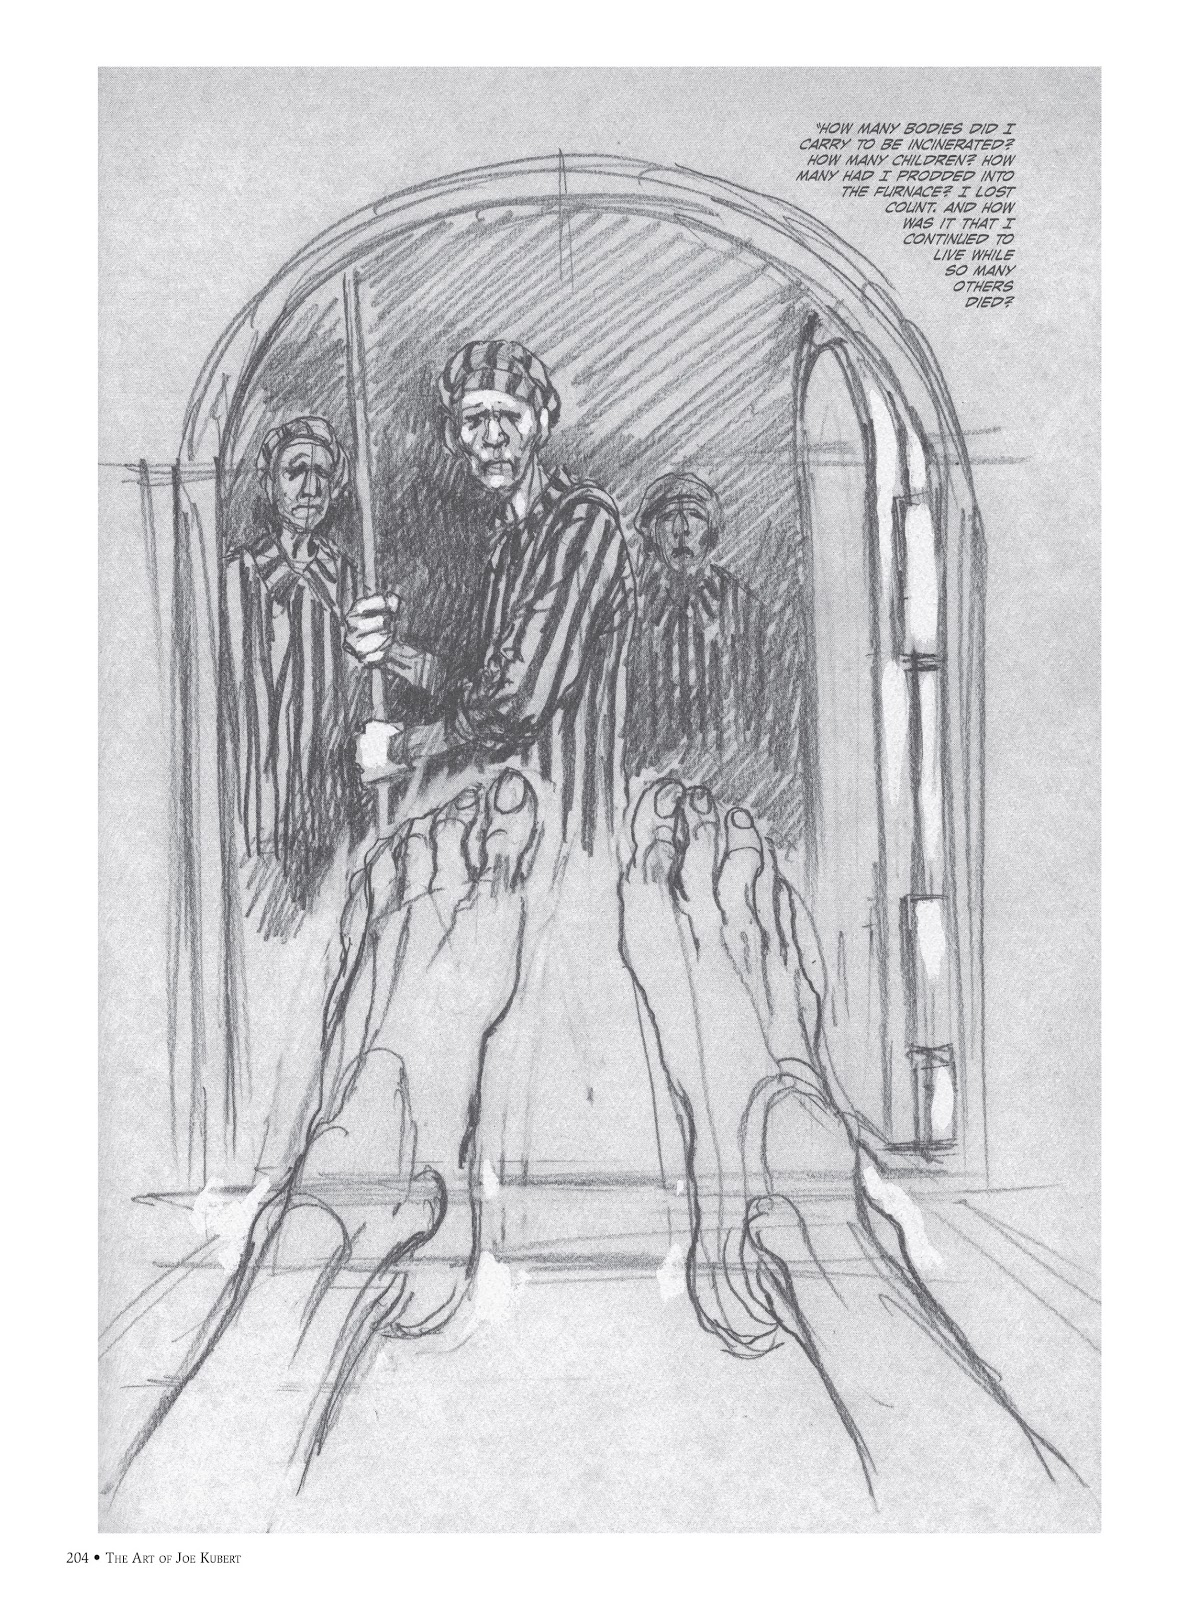 Read online The Art of Joe Kubert comic -  Issue # TPB (Part 3) - 4